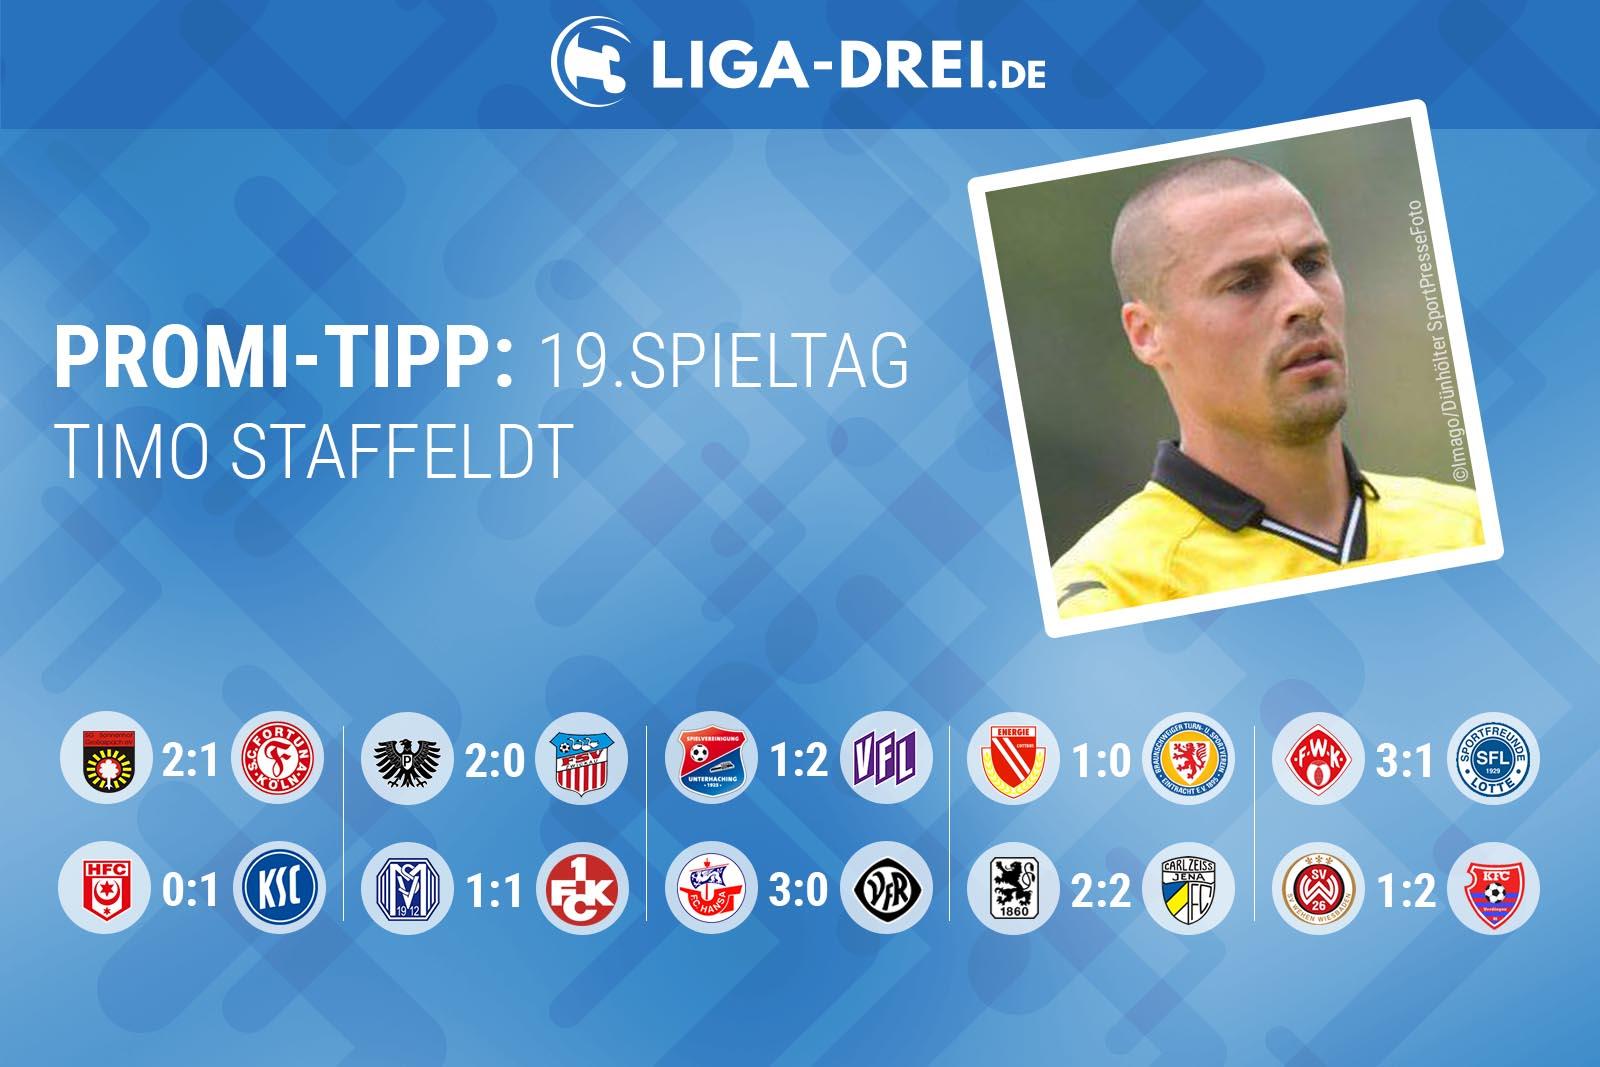 Timo Staffeldt beim Liga-Drei.de Promi-Tipp